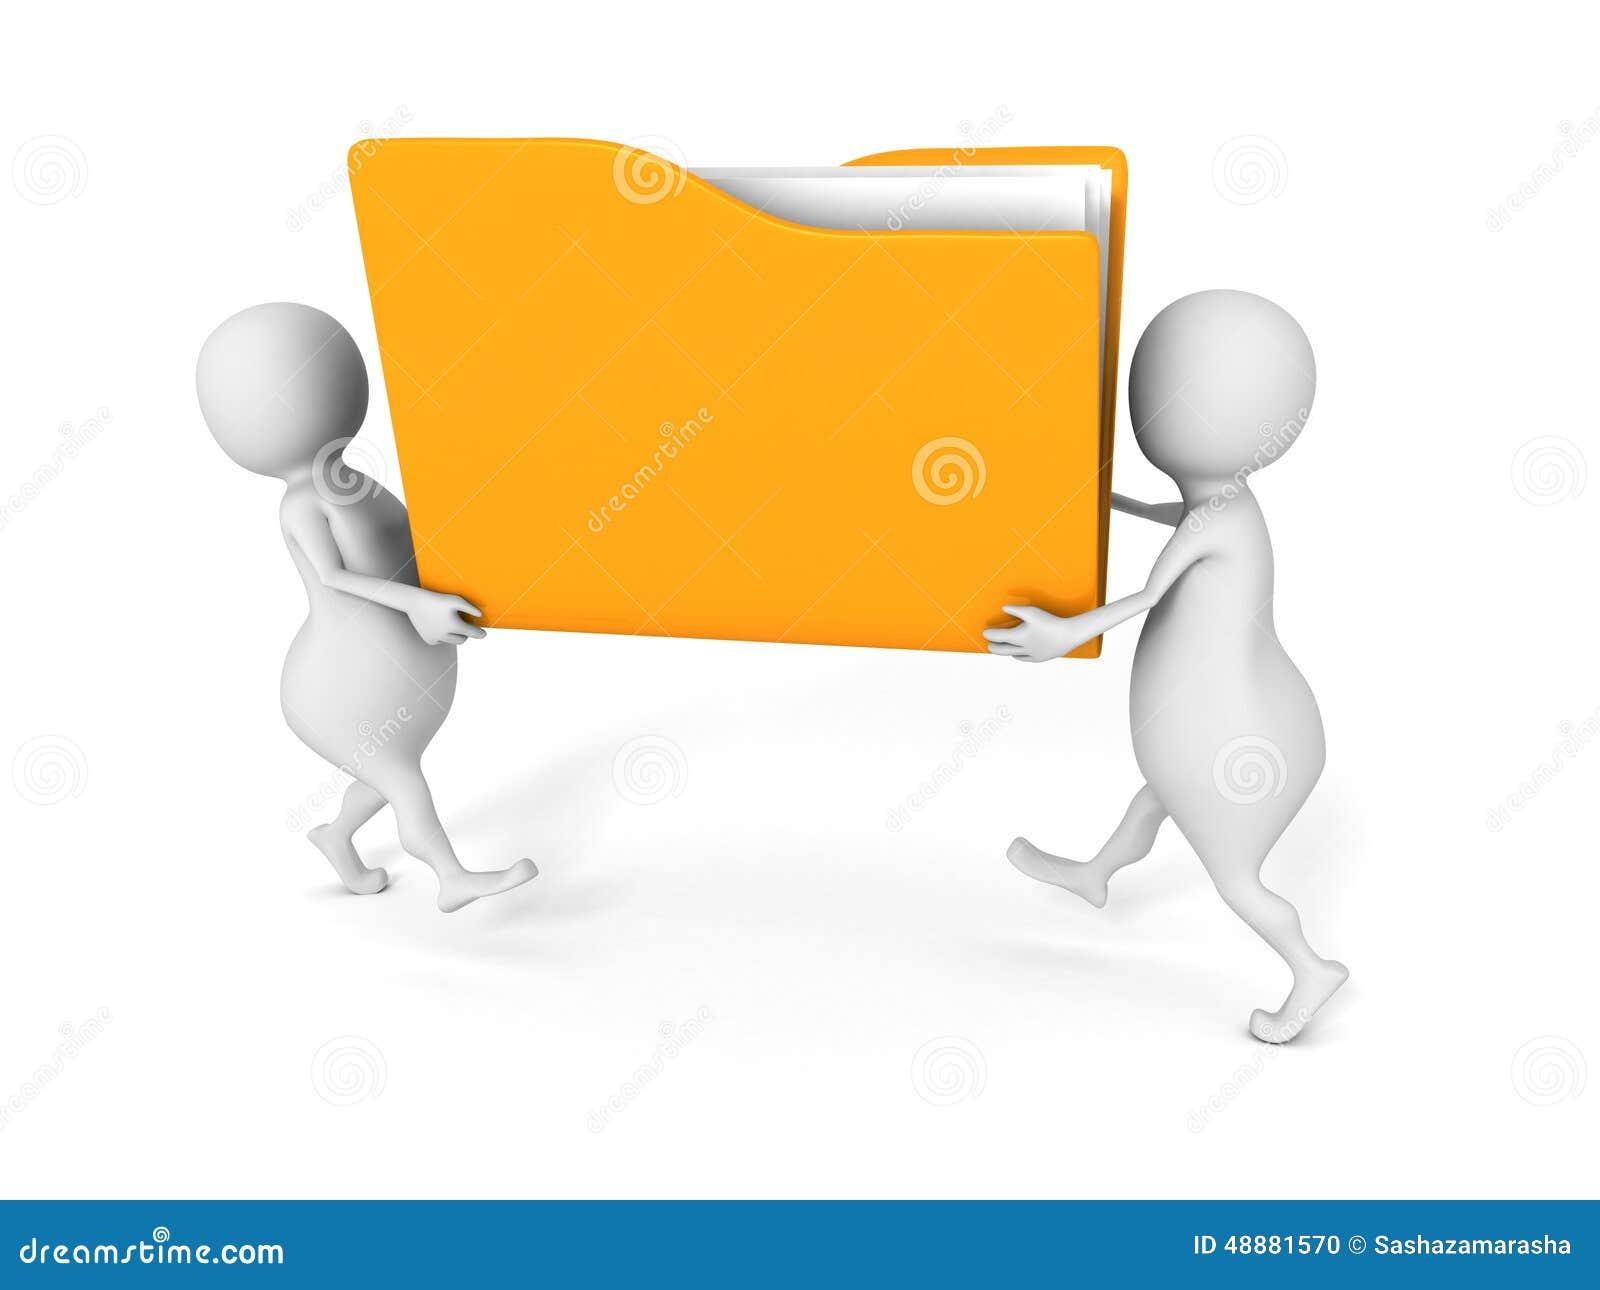 ... Office Document Paper File Folder Stock Illustration - Image: 48881570